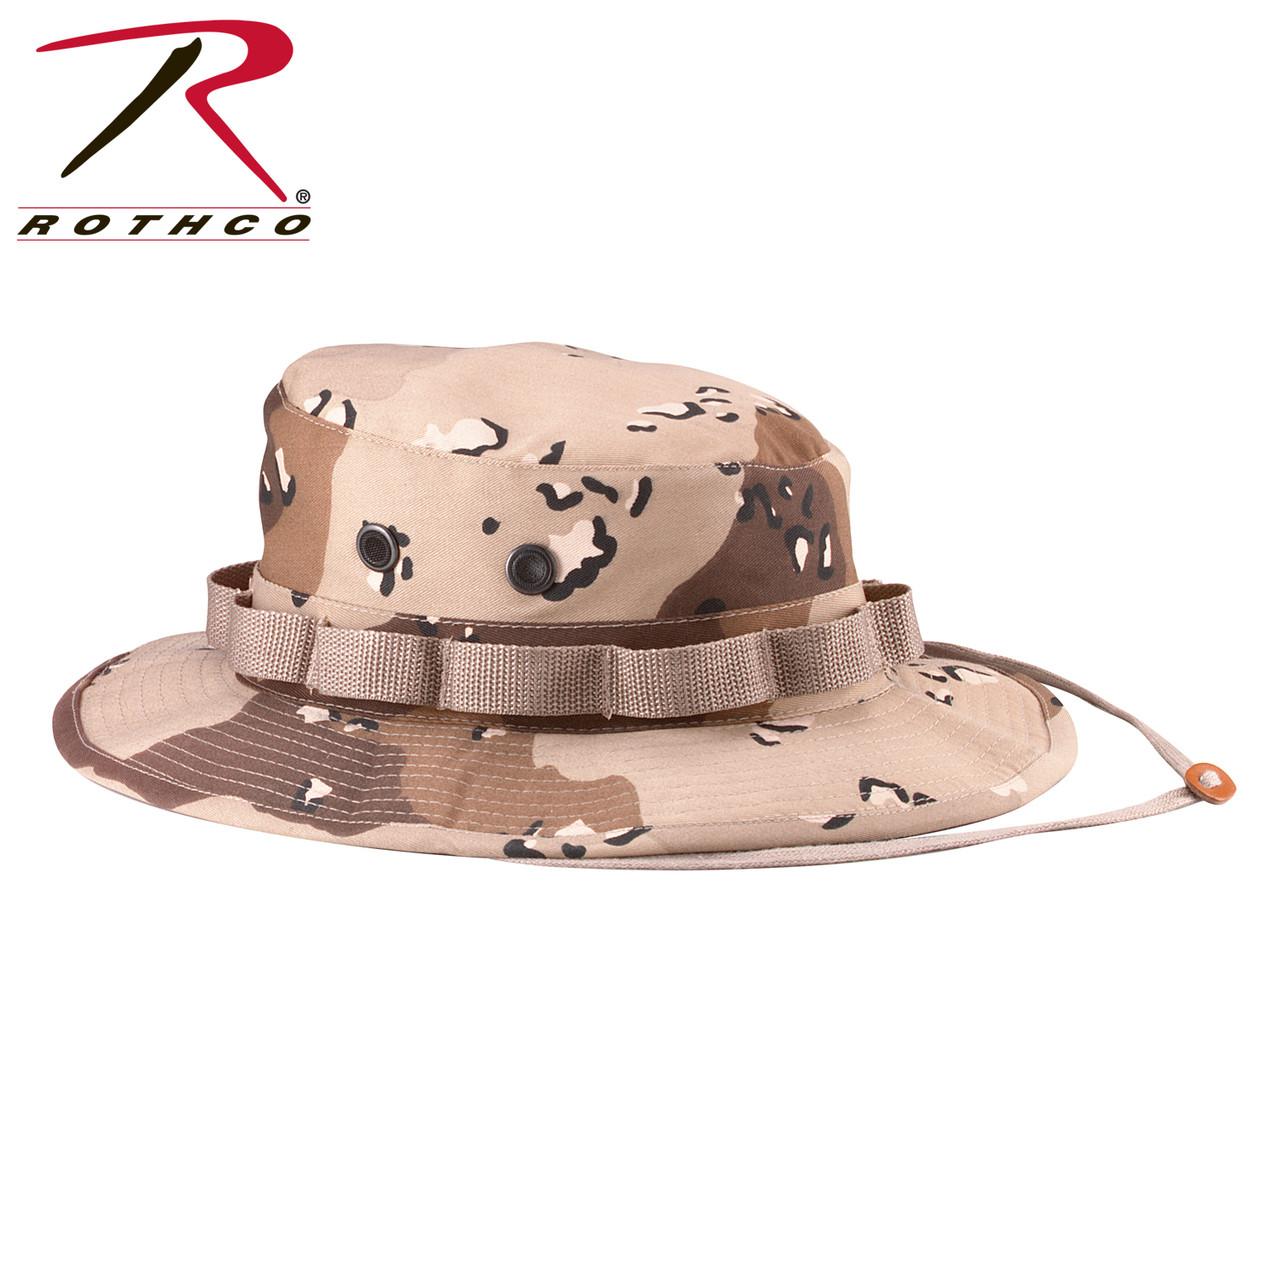 5b373948f5e Rothco Desert Woodland Camo Boonie Hats